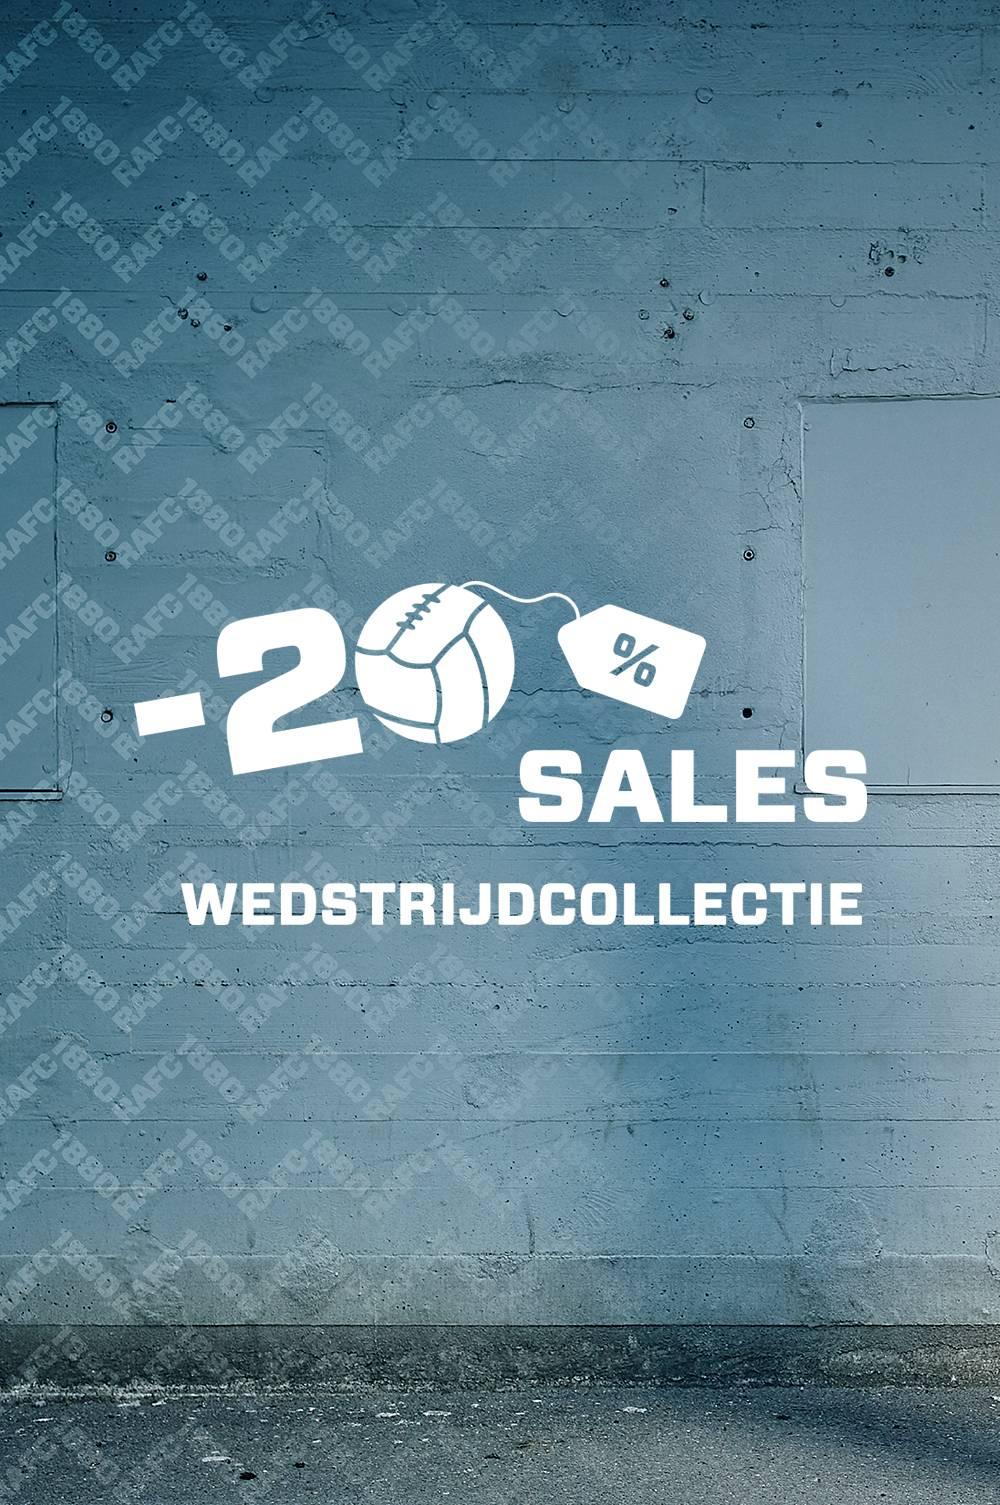 Trainingscollectie seizoen 2019-20-1